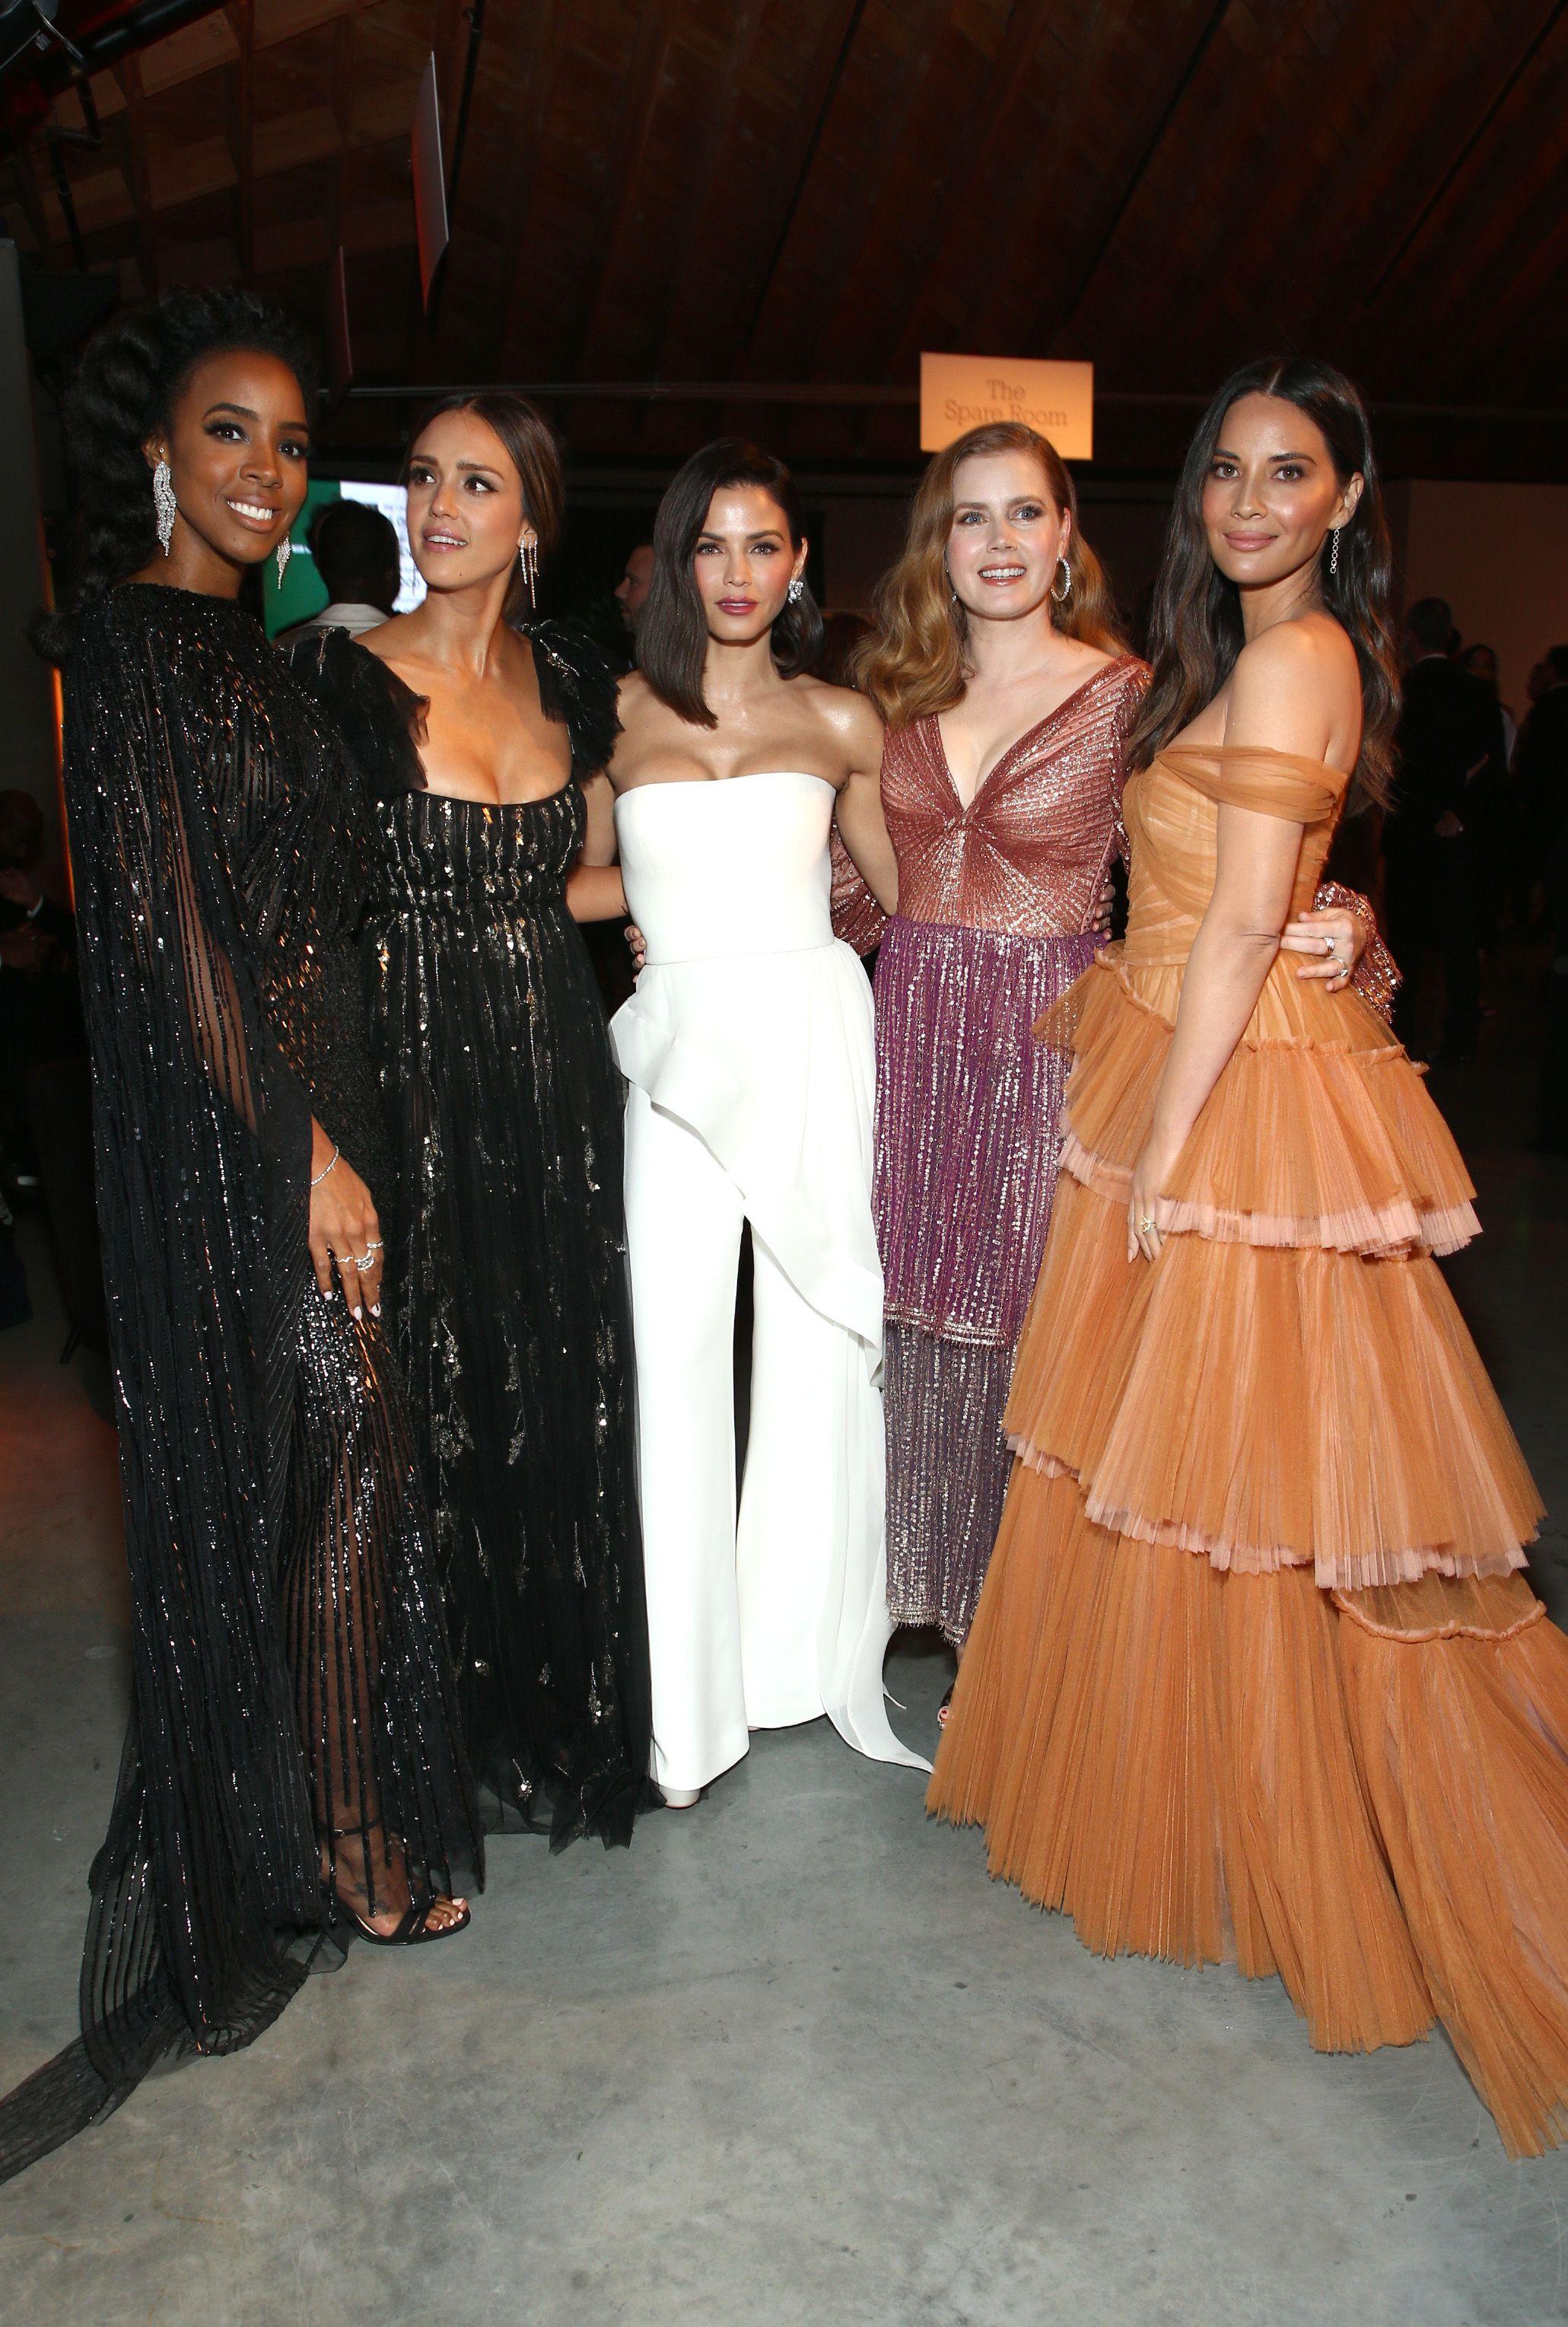 Kelly Rowland, Jessica Alba, Jenna Dewan, Amy Adams and Olivia MunnBaby2Baby Gala, Inside, Los Angeles, USA - 10 Nov 2018